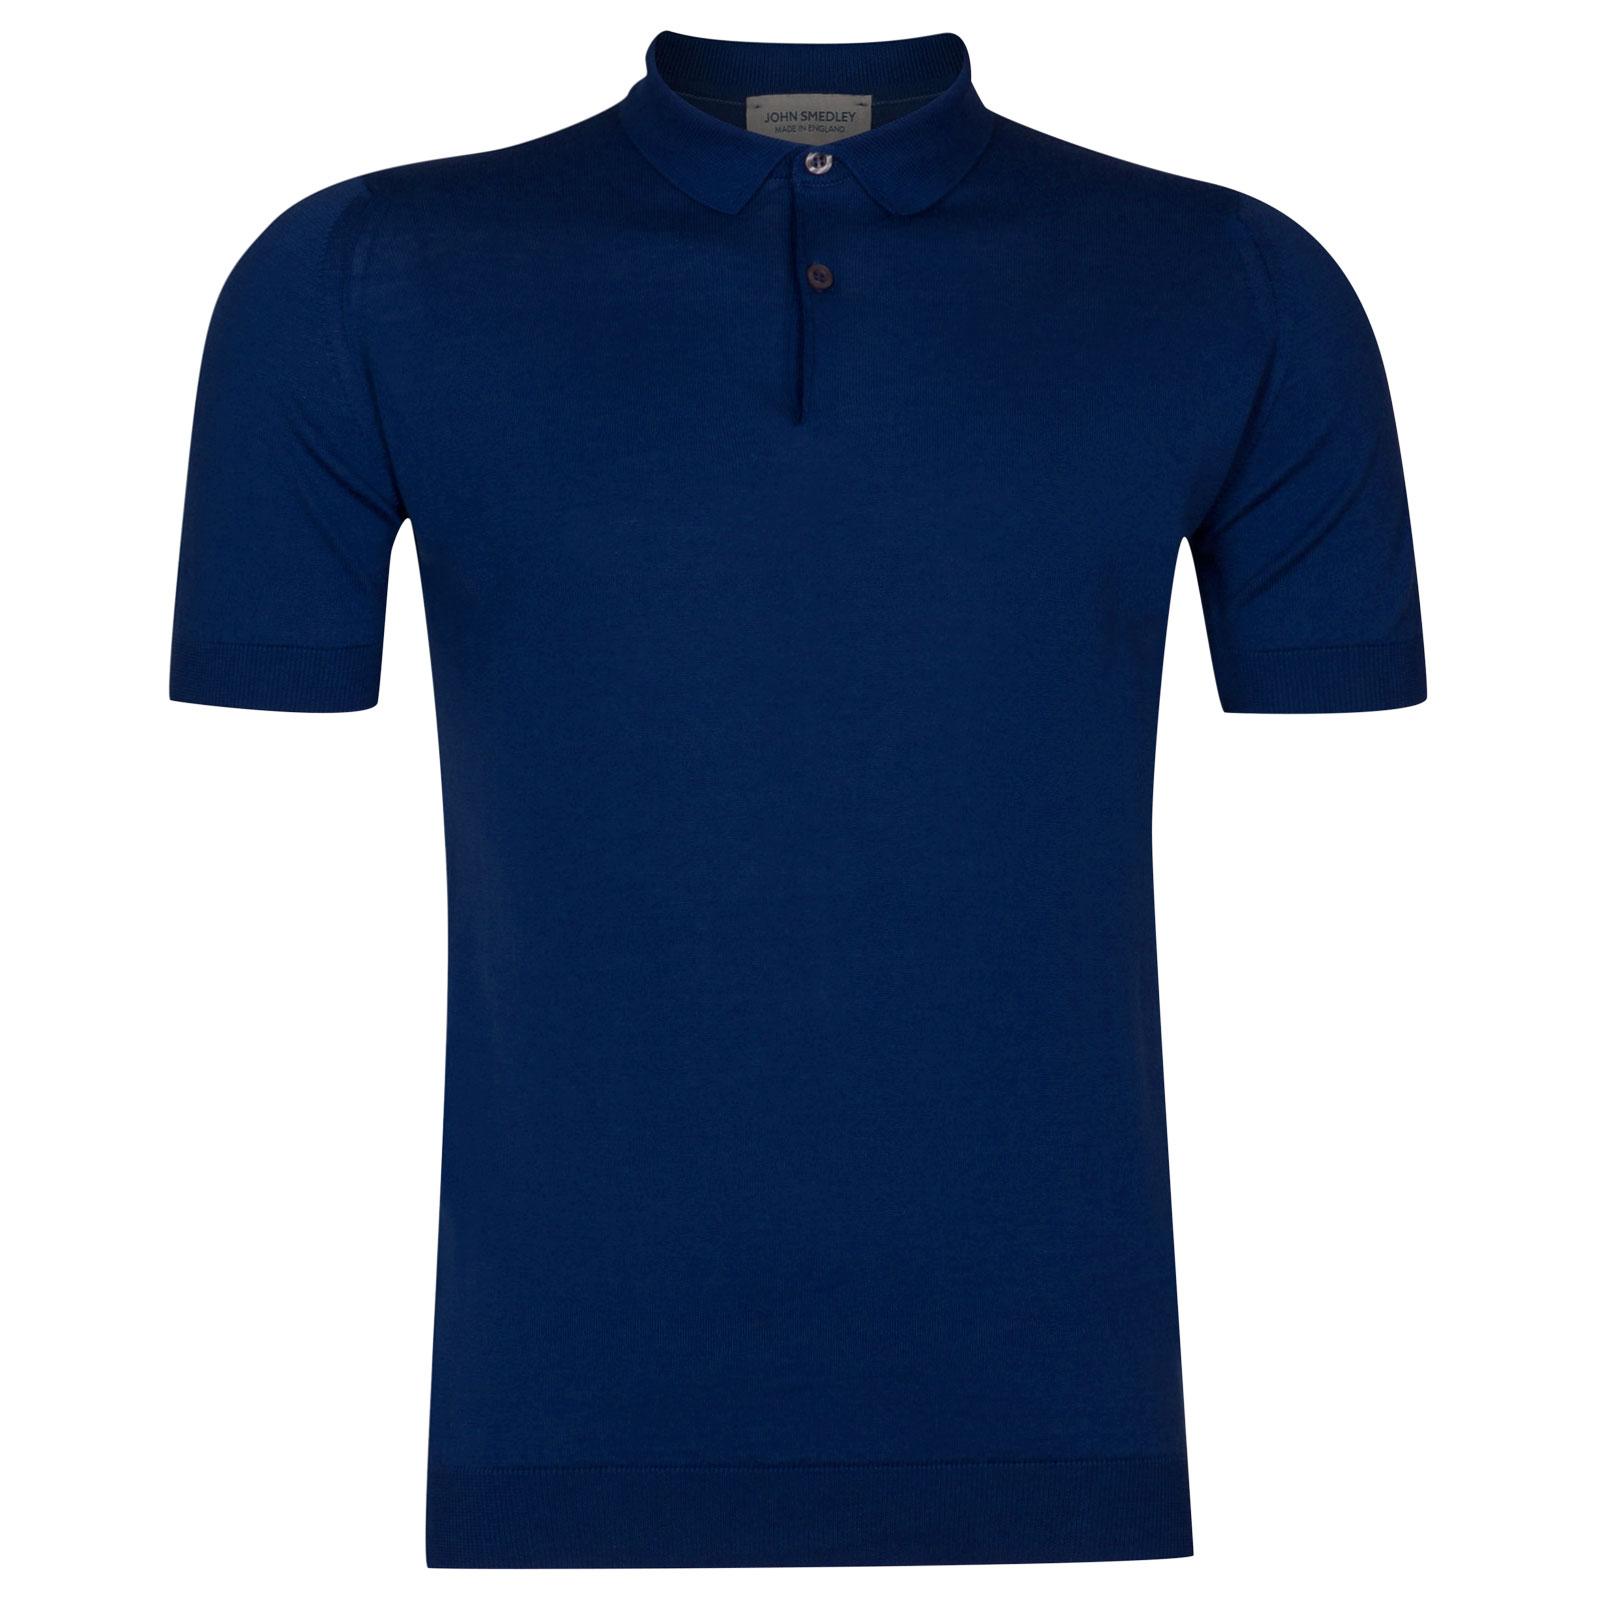 rhodes-stevens-blue-Xl